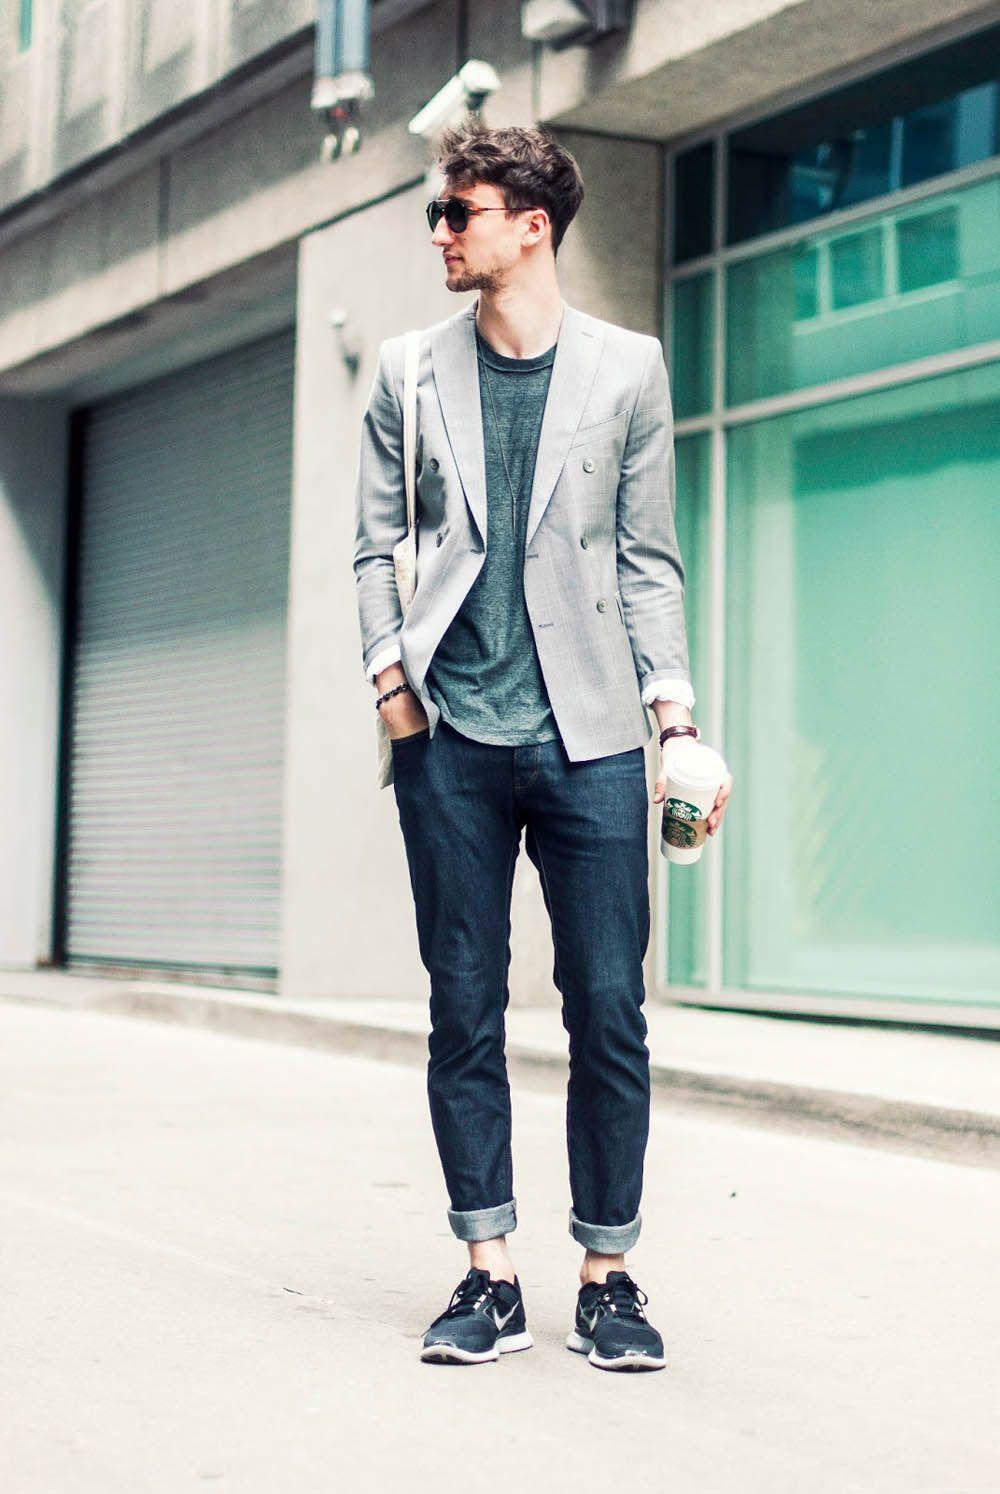 nike blazer mens white jeans